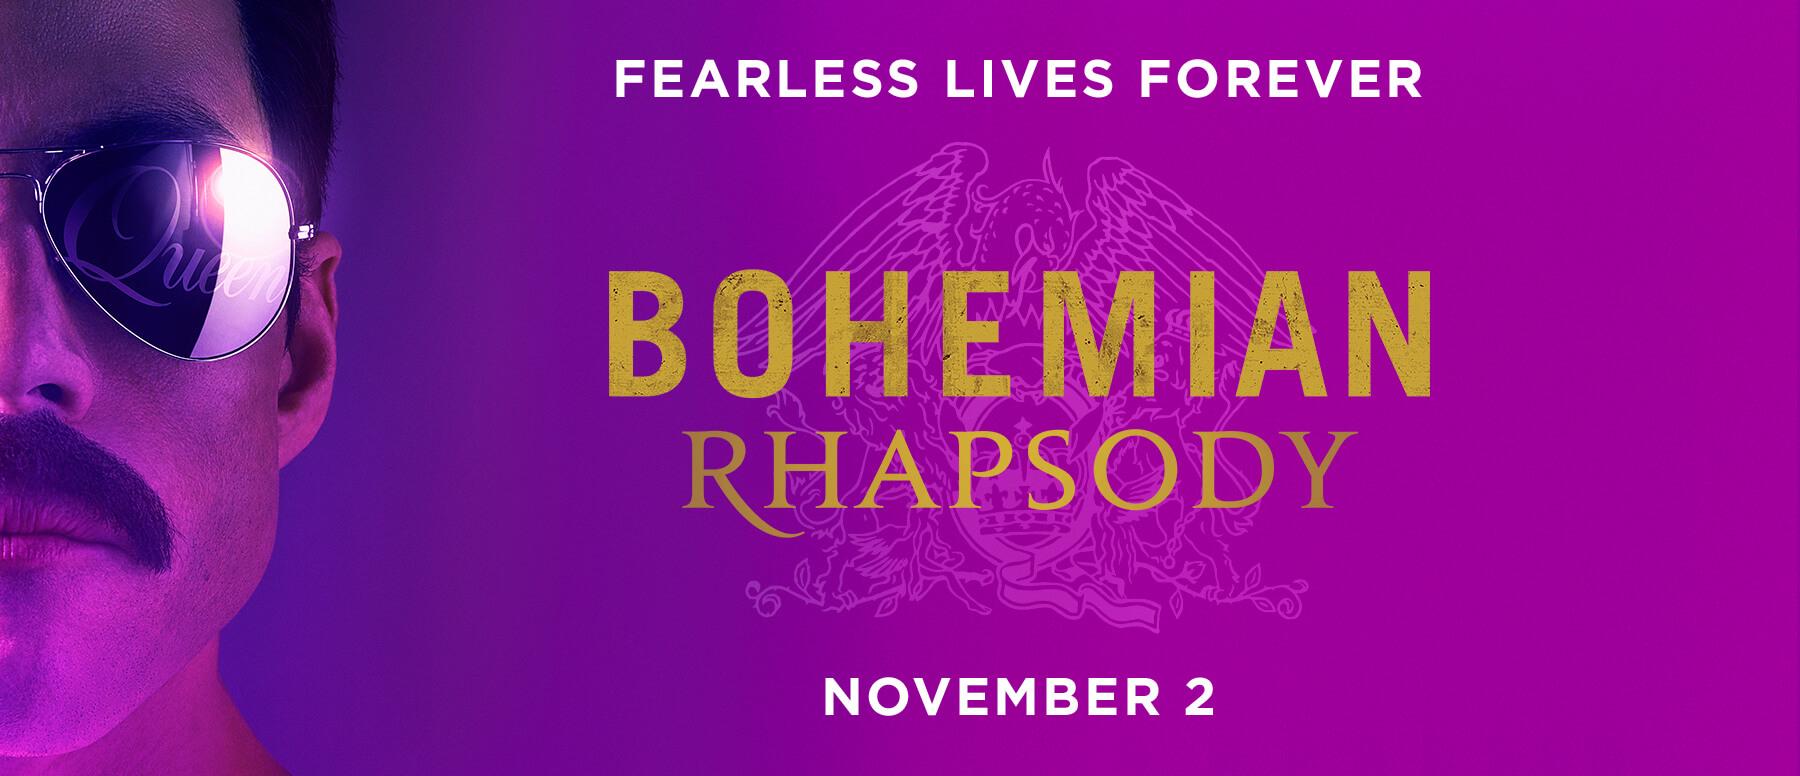 Bohemian Rhapsody biopic banner